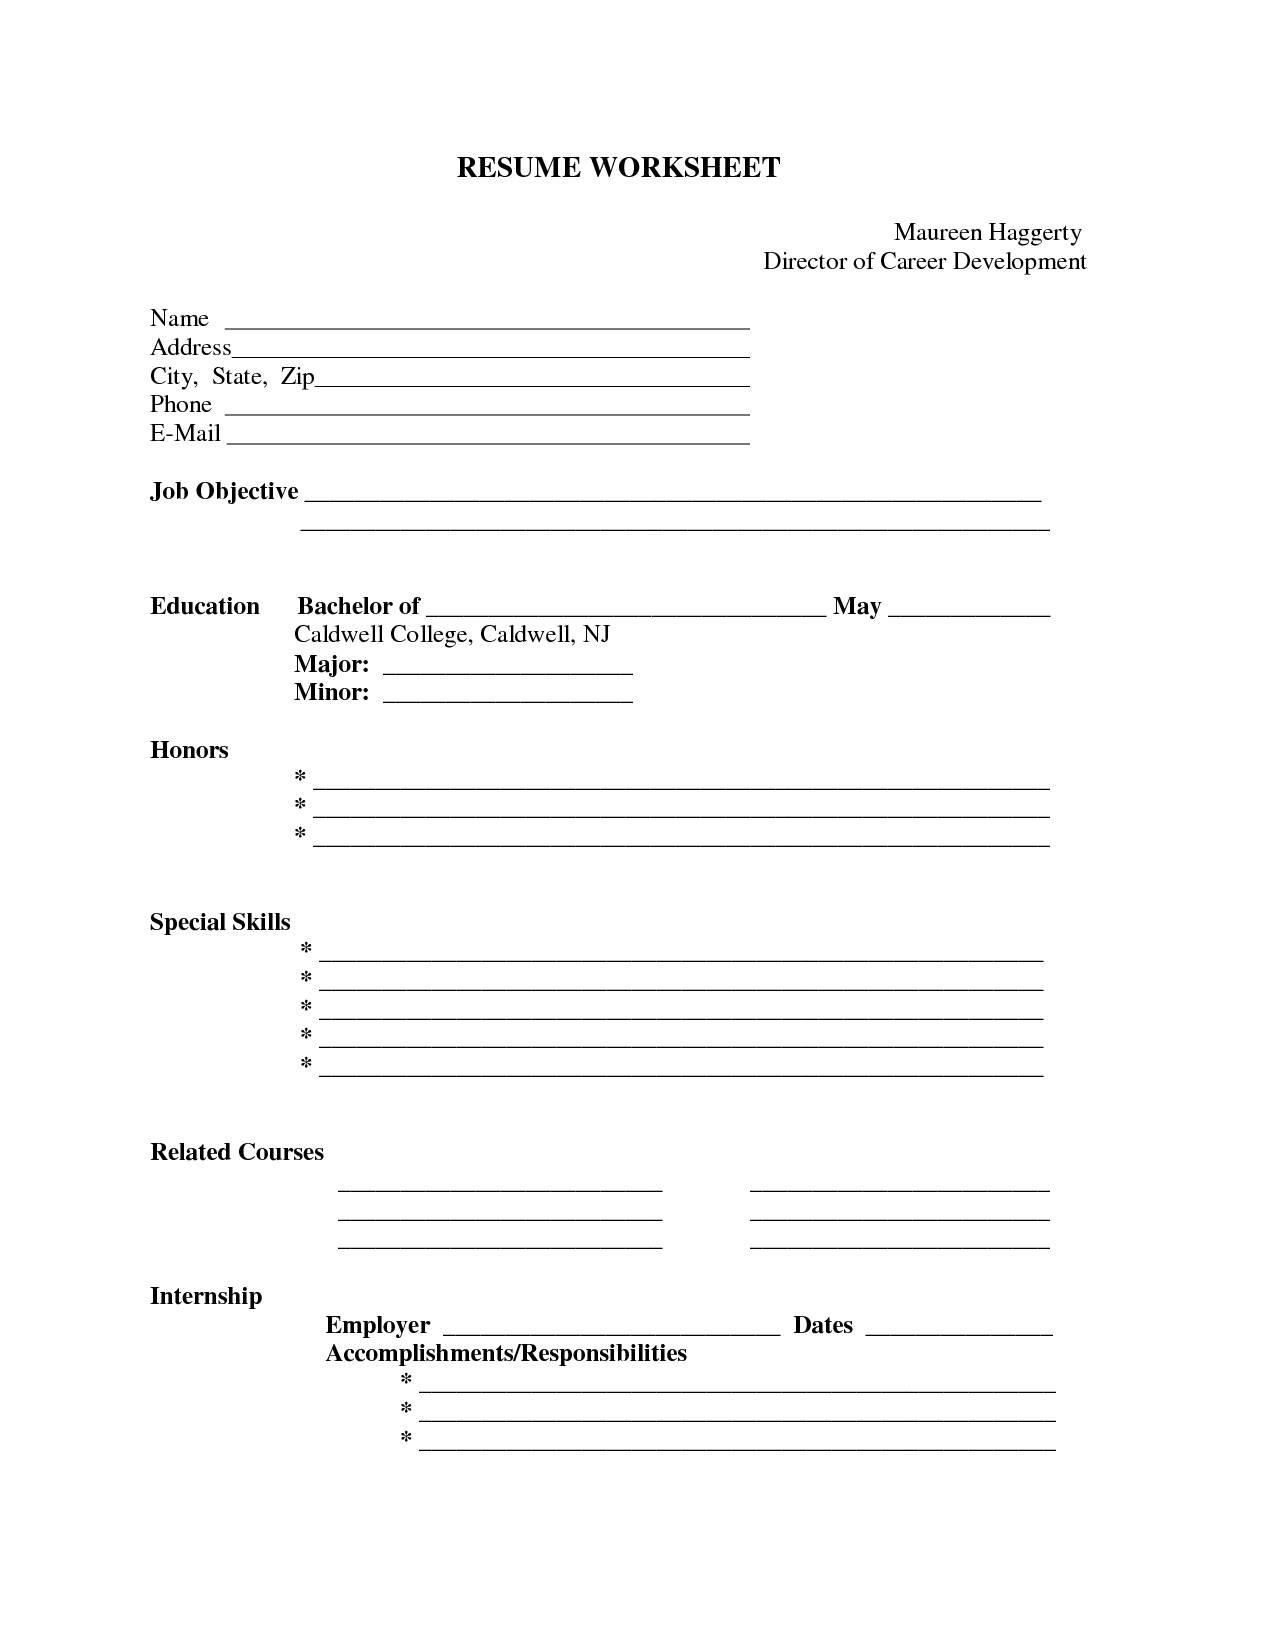 Printable Blank Resume | Bijeefopijburg.nl - Free Printable Blank Resume